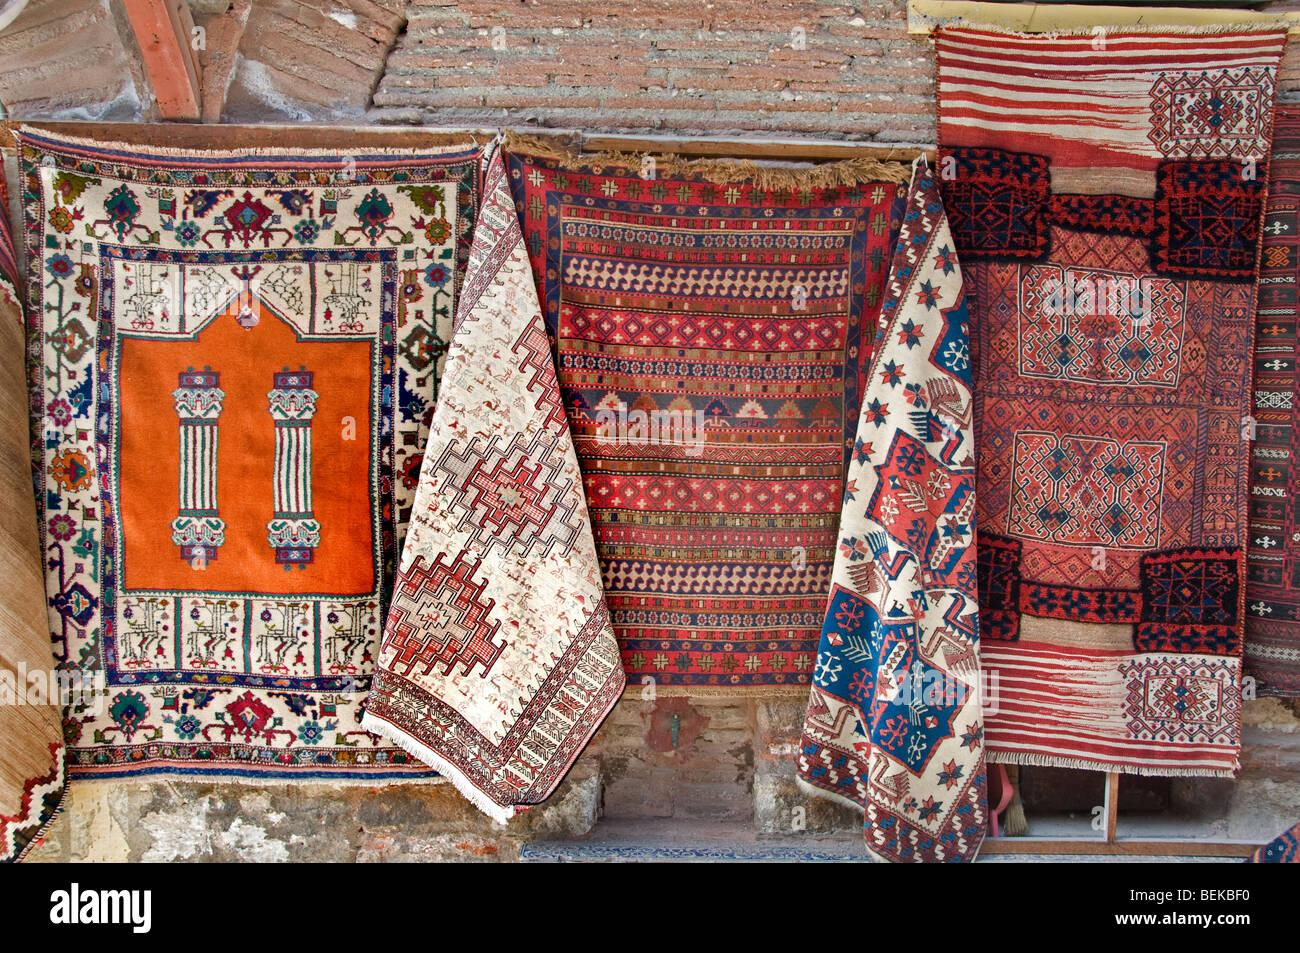 Sultanahmet Istanbul Türkei Teppich Teppiche shop Stockbild